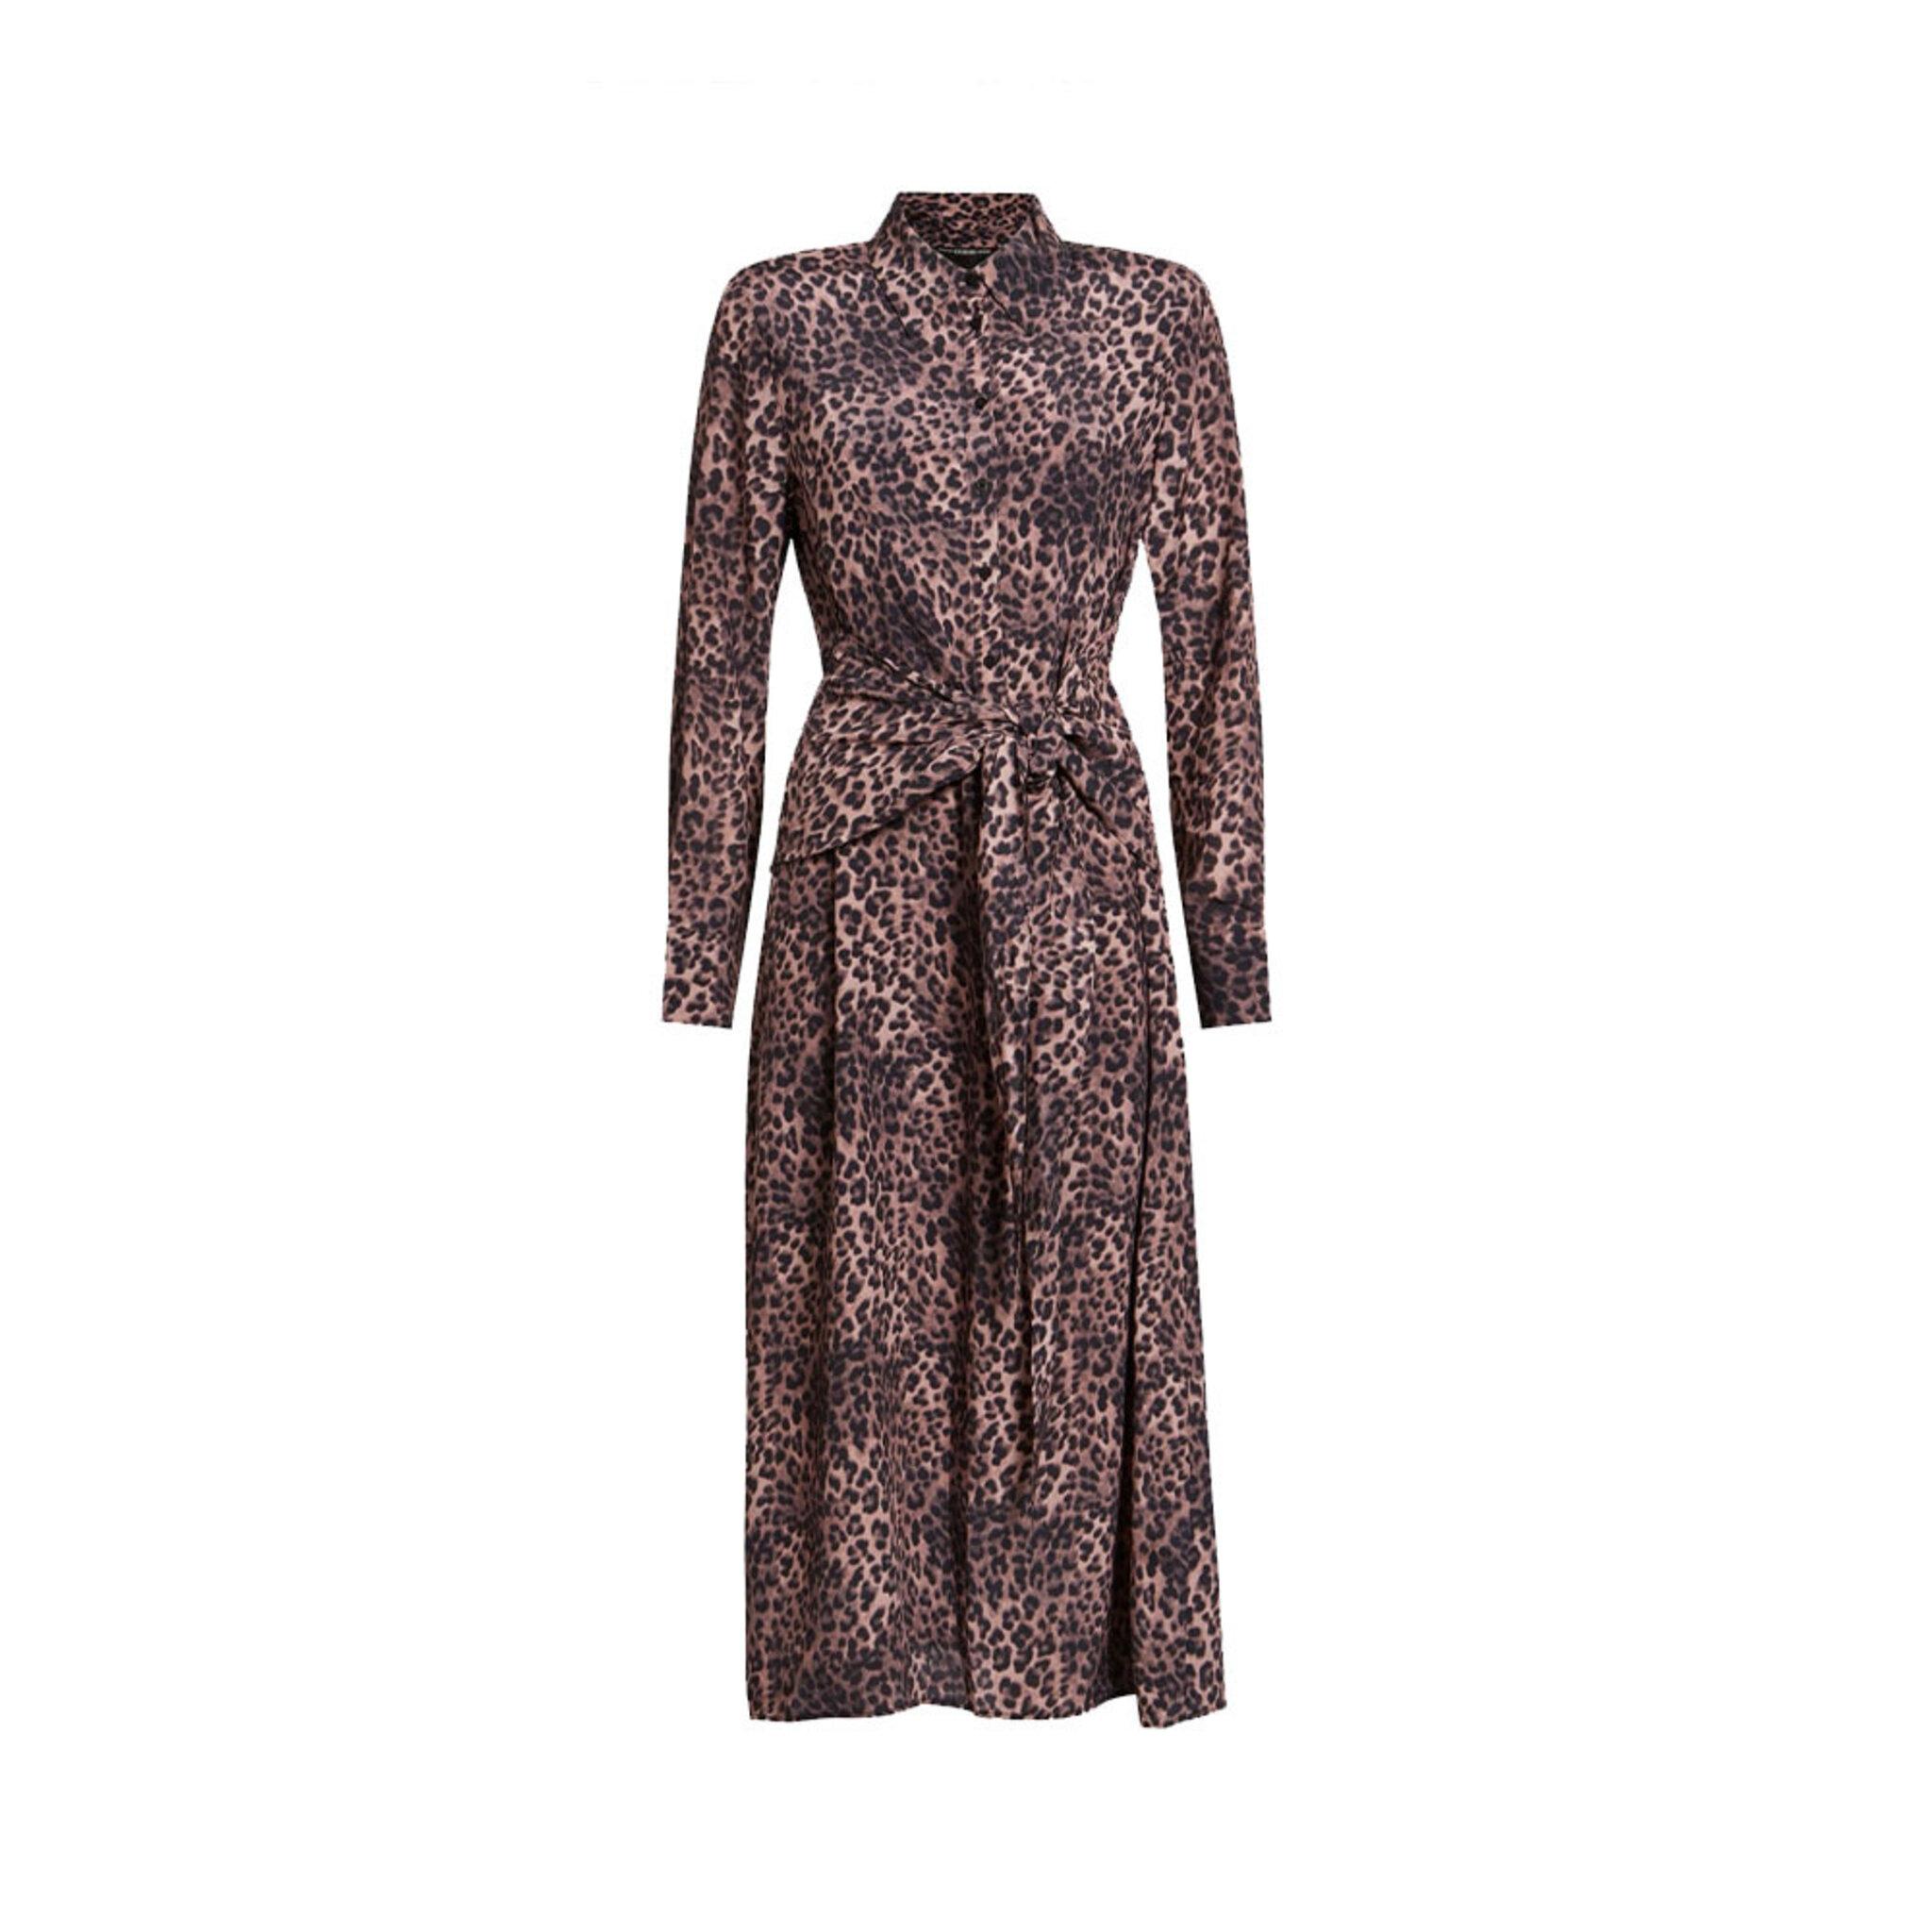 SELVAGGIA DRESS Dress